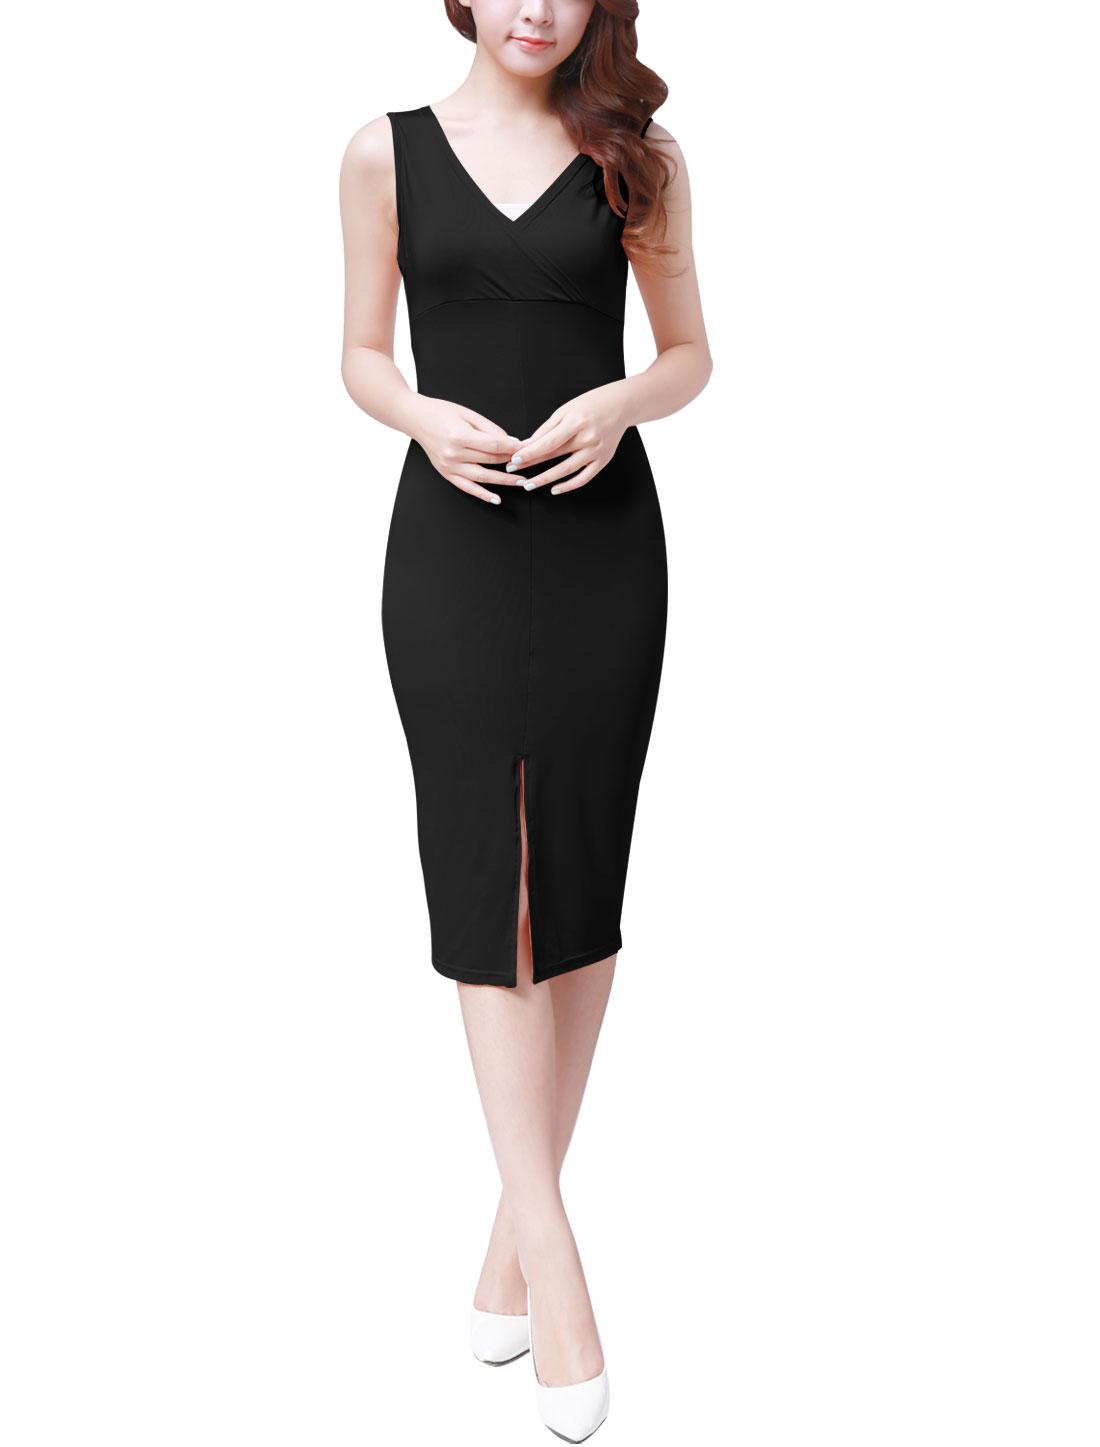 Stylish Ladies Solid Black Split Front Detail Knee-Length Dress L